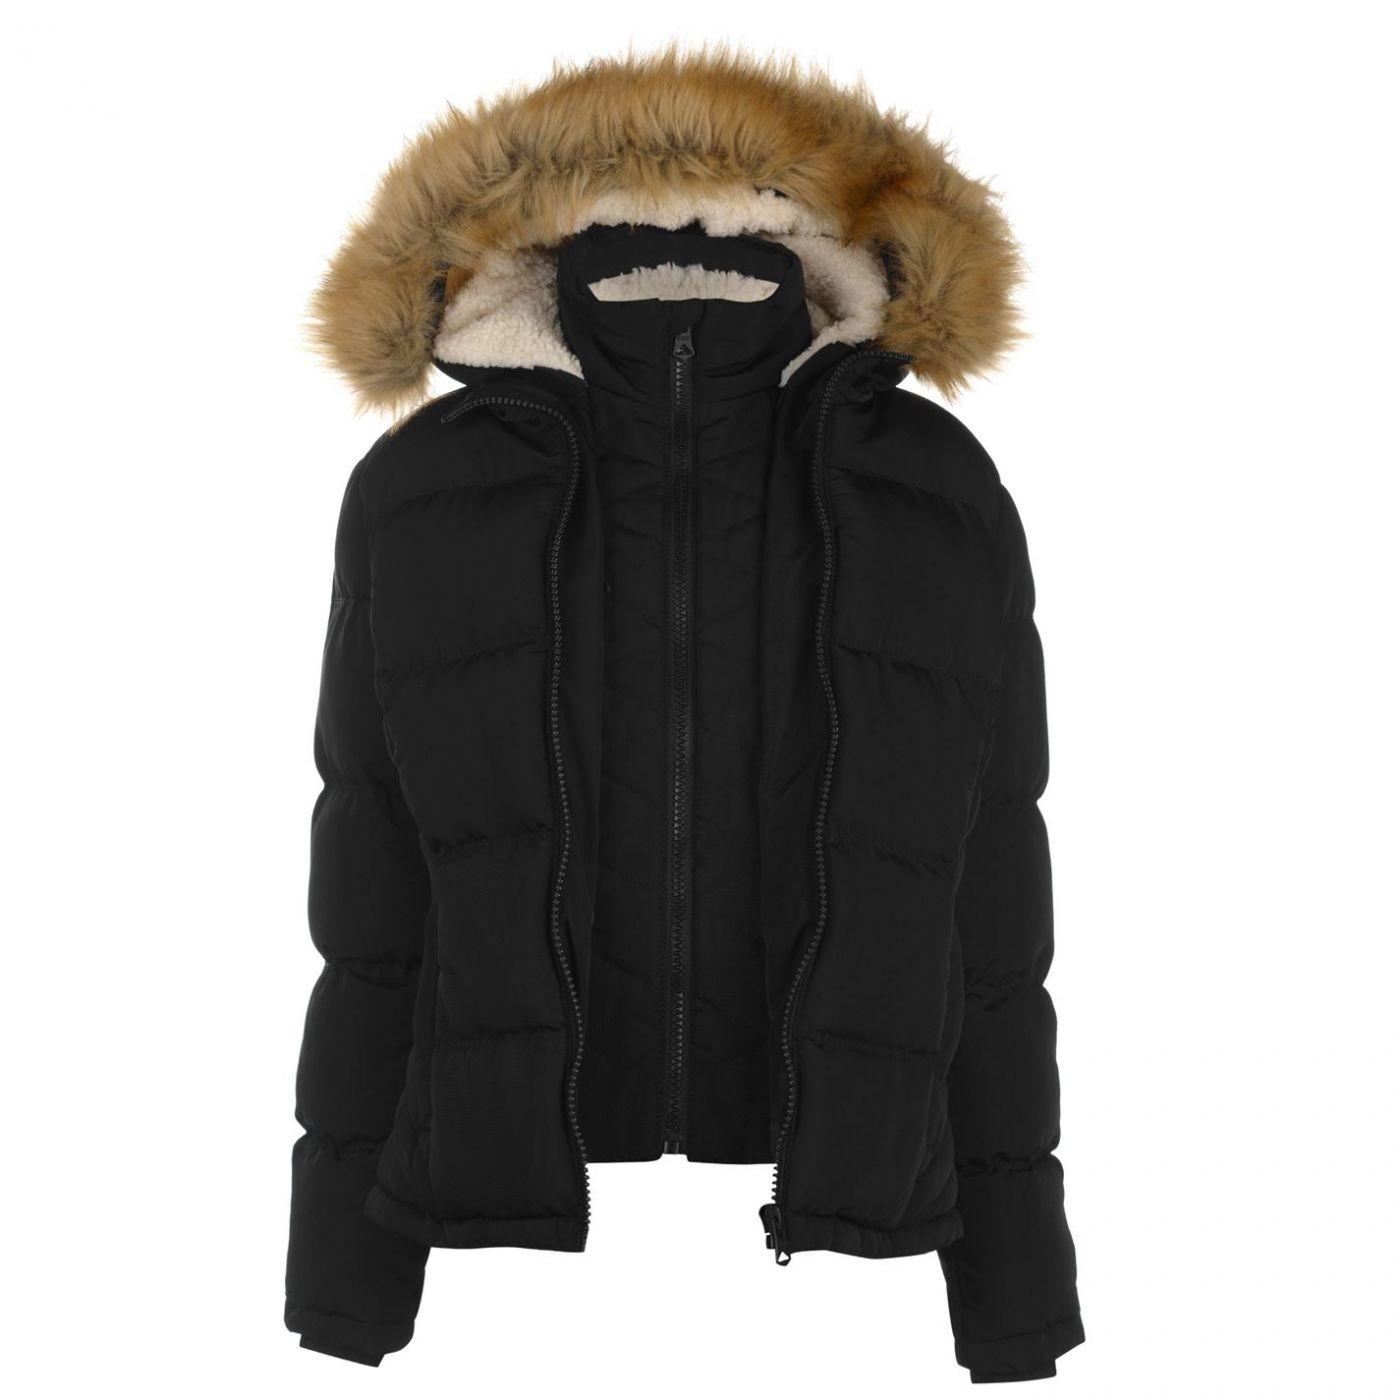 86915ad97e SoulCal Two Zip Bubble Jacket Ladies - FACTCOOL